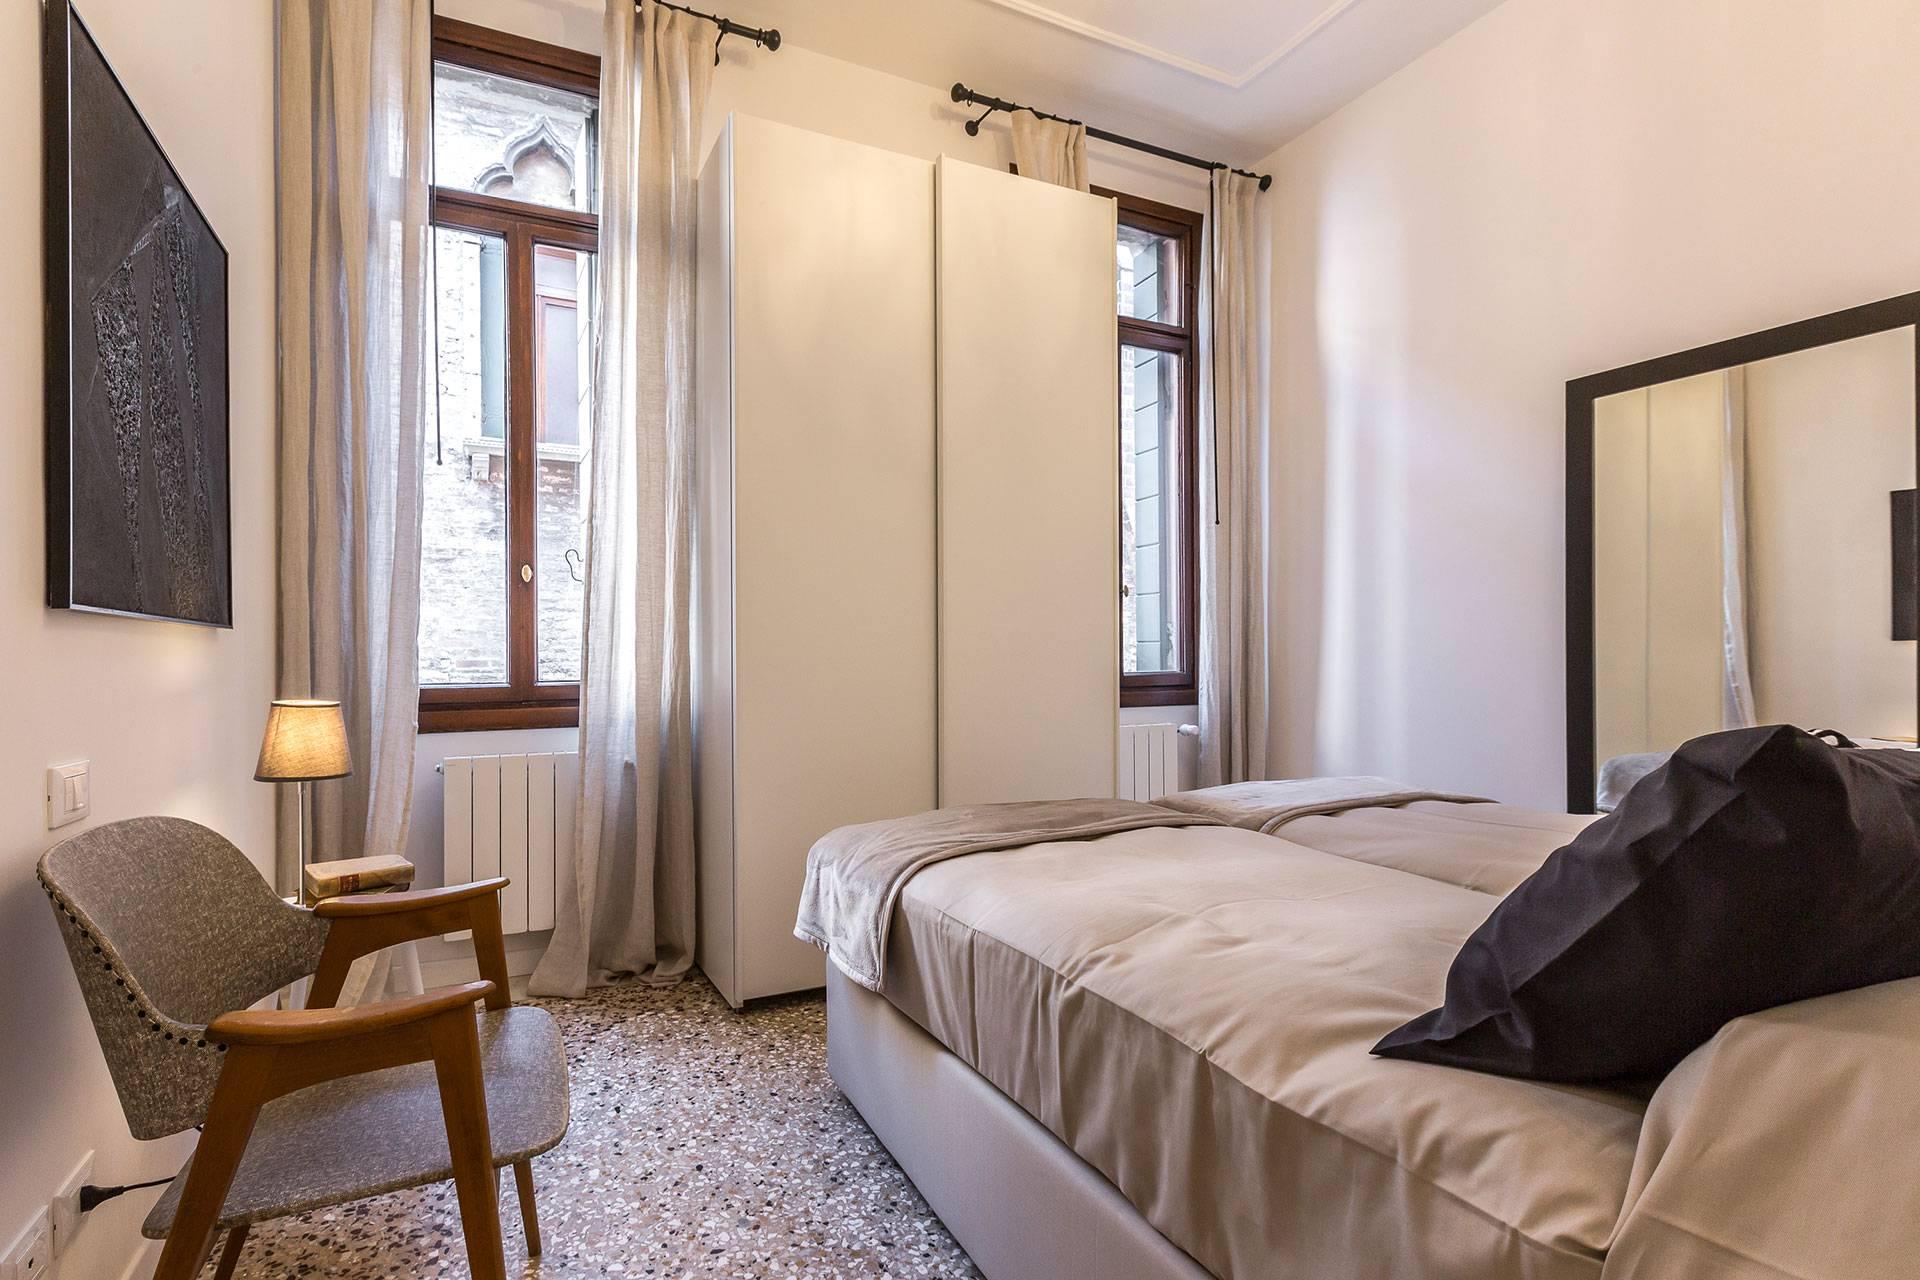 bedroom 2, double or twin